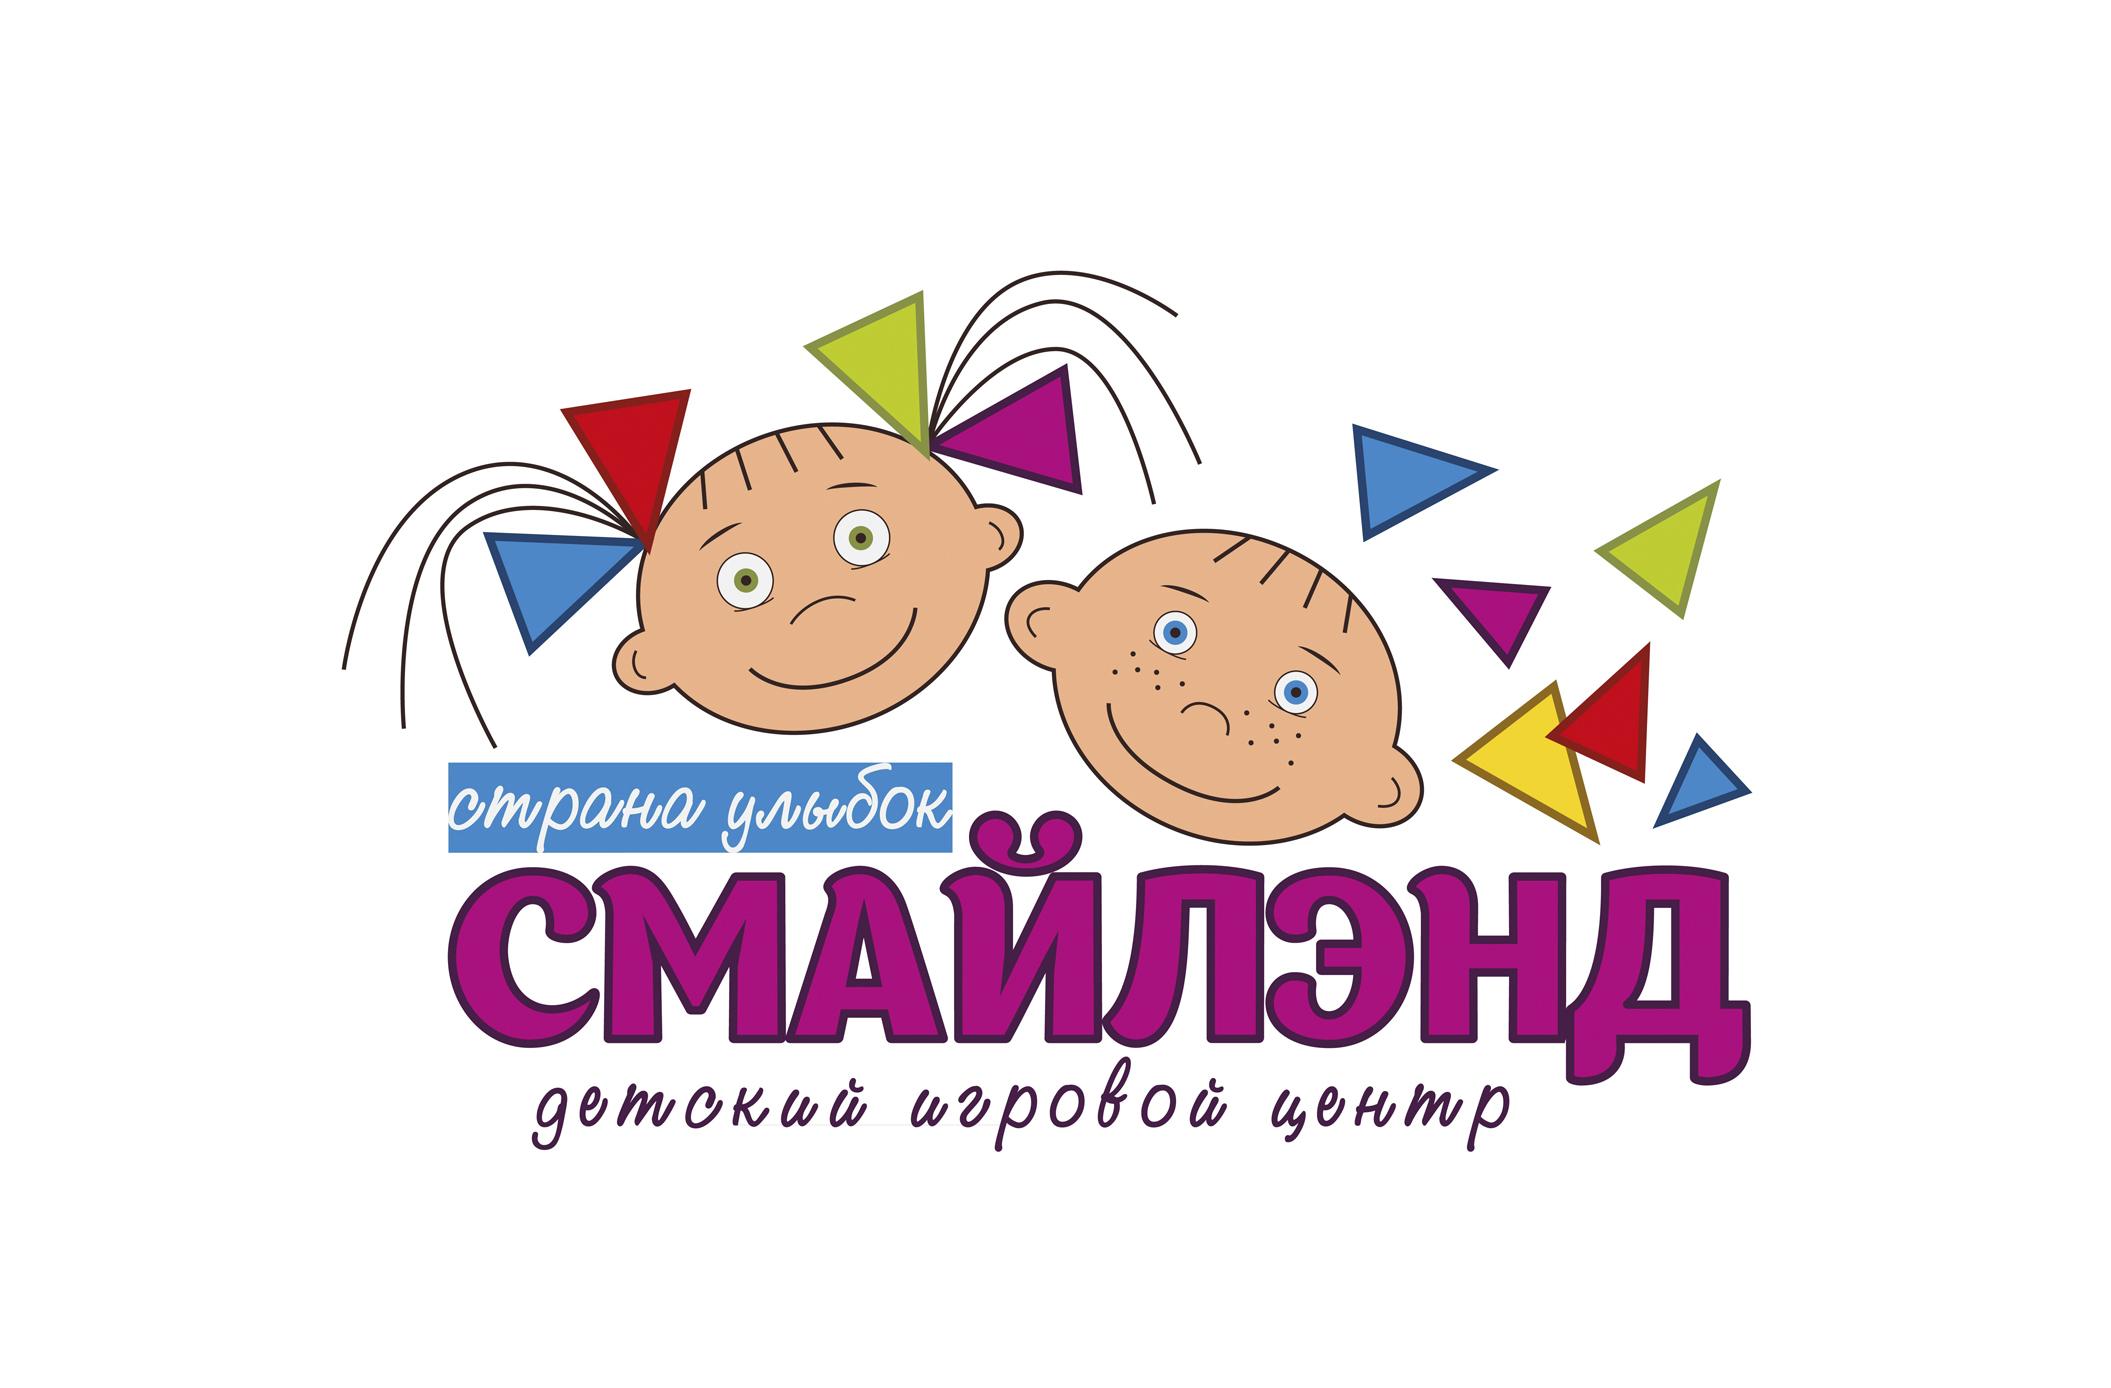 Логотип, стиль для детского игрового центра. фото f_9045a44c74f04495.jpg